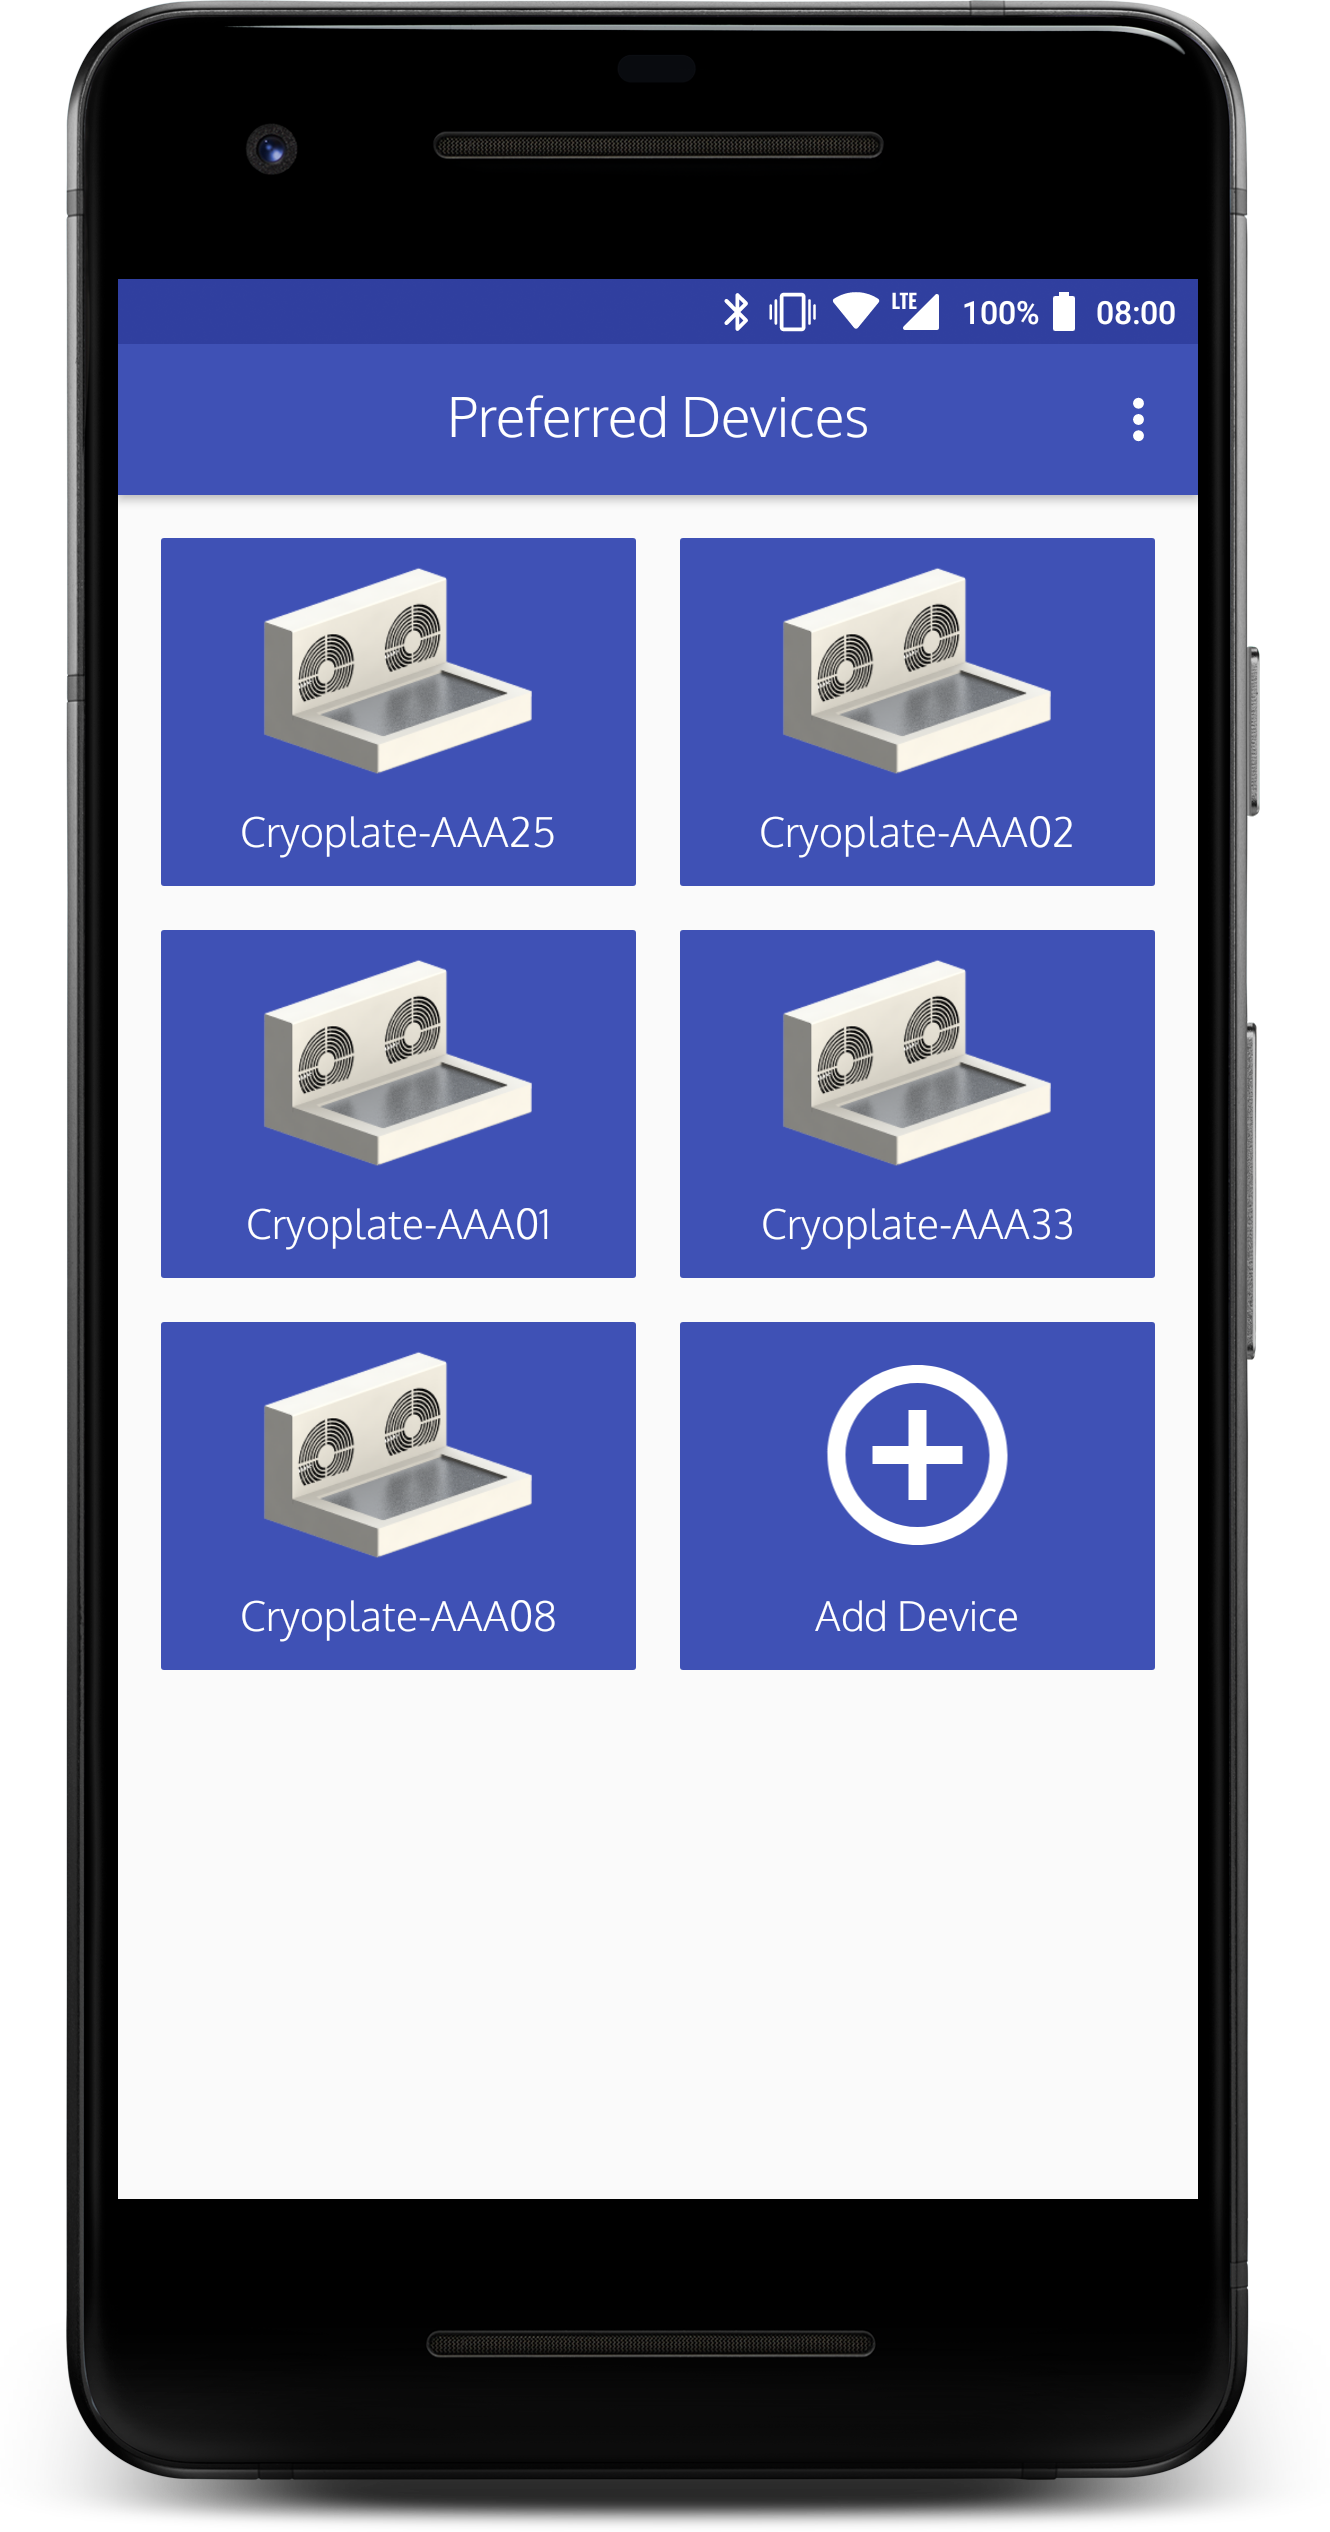 Cryoplate App device listing